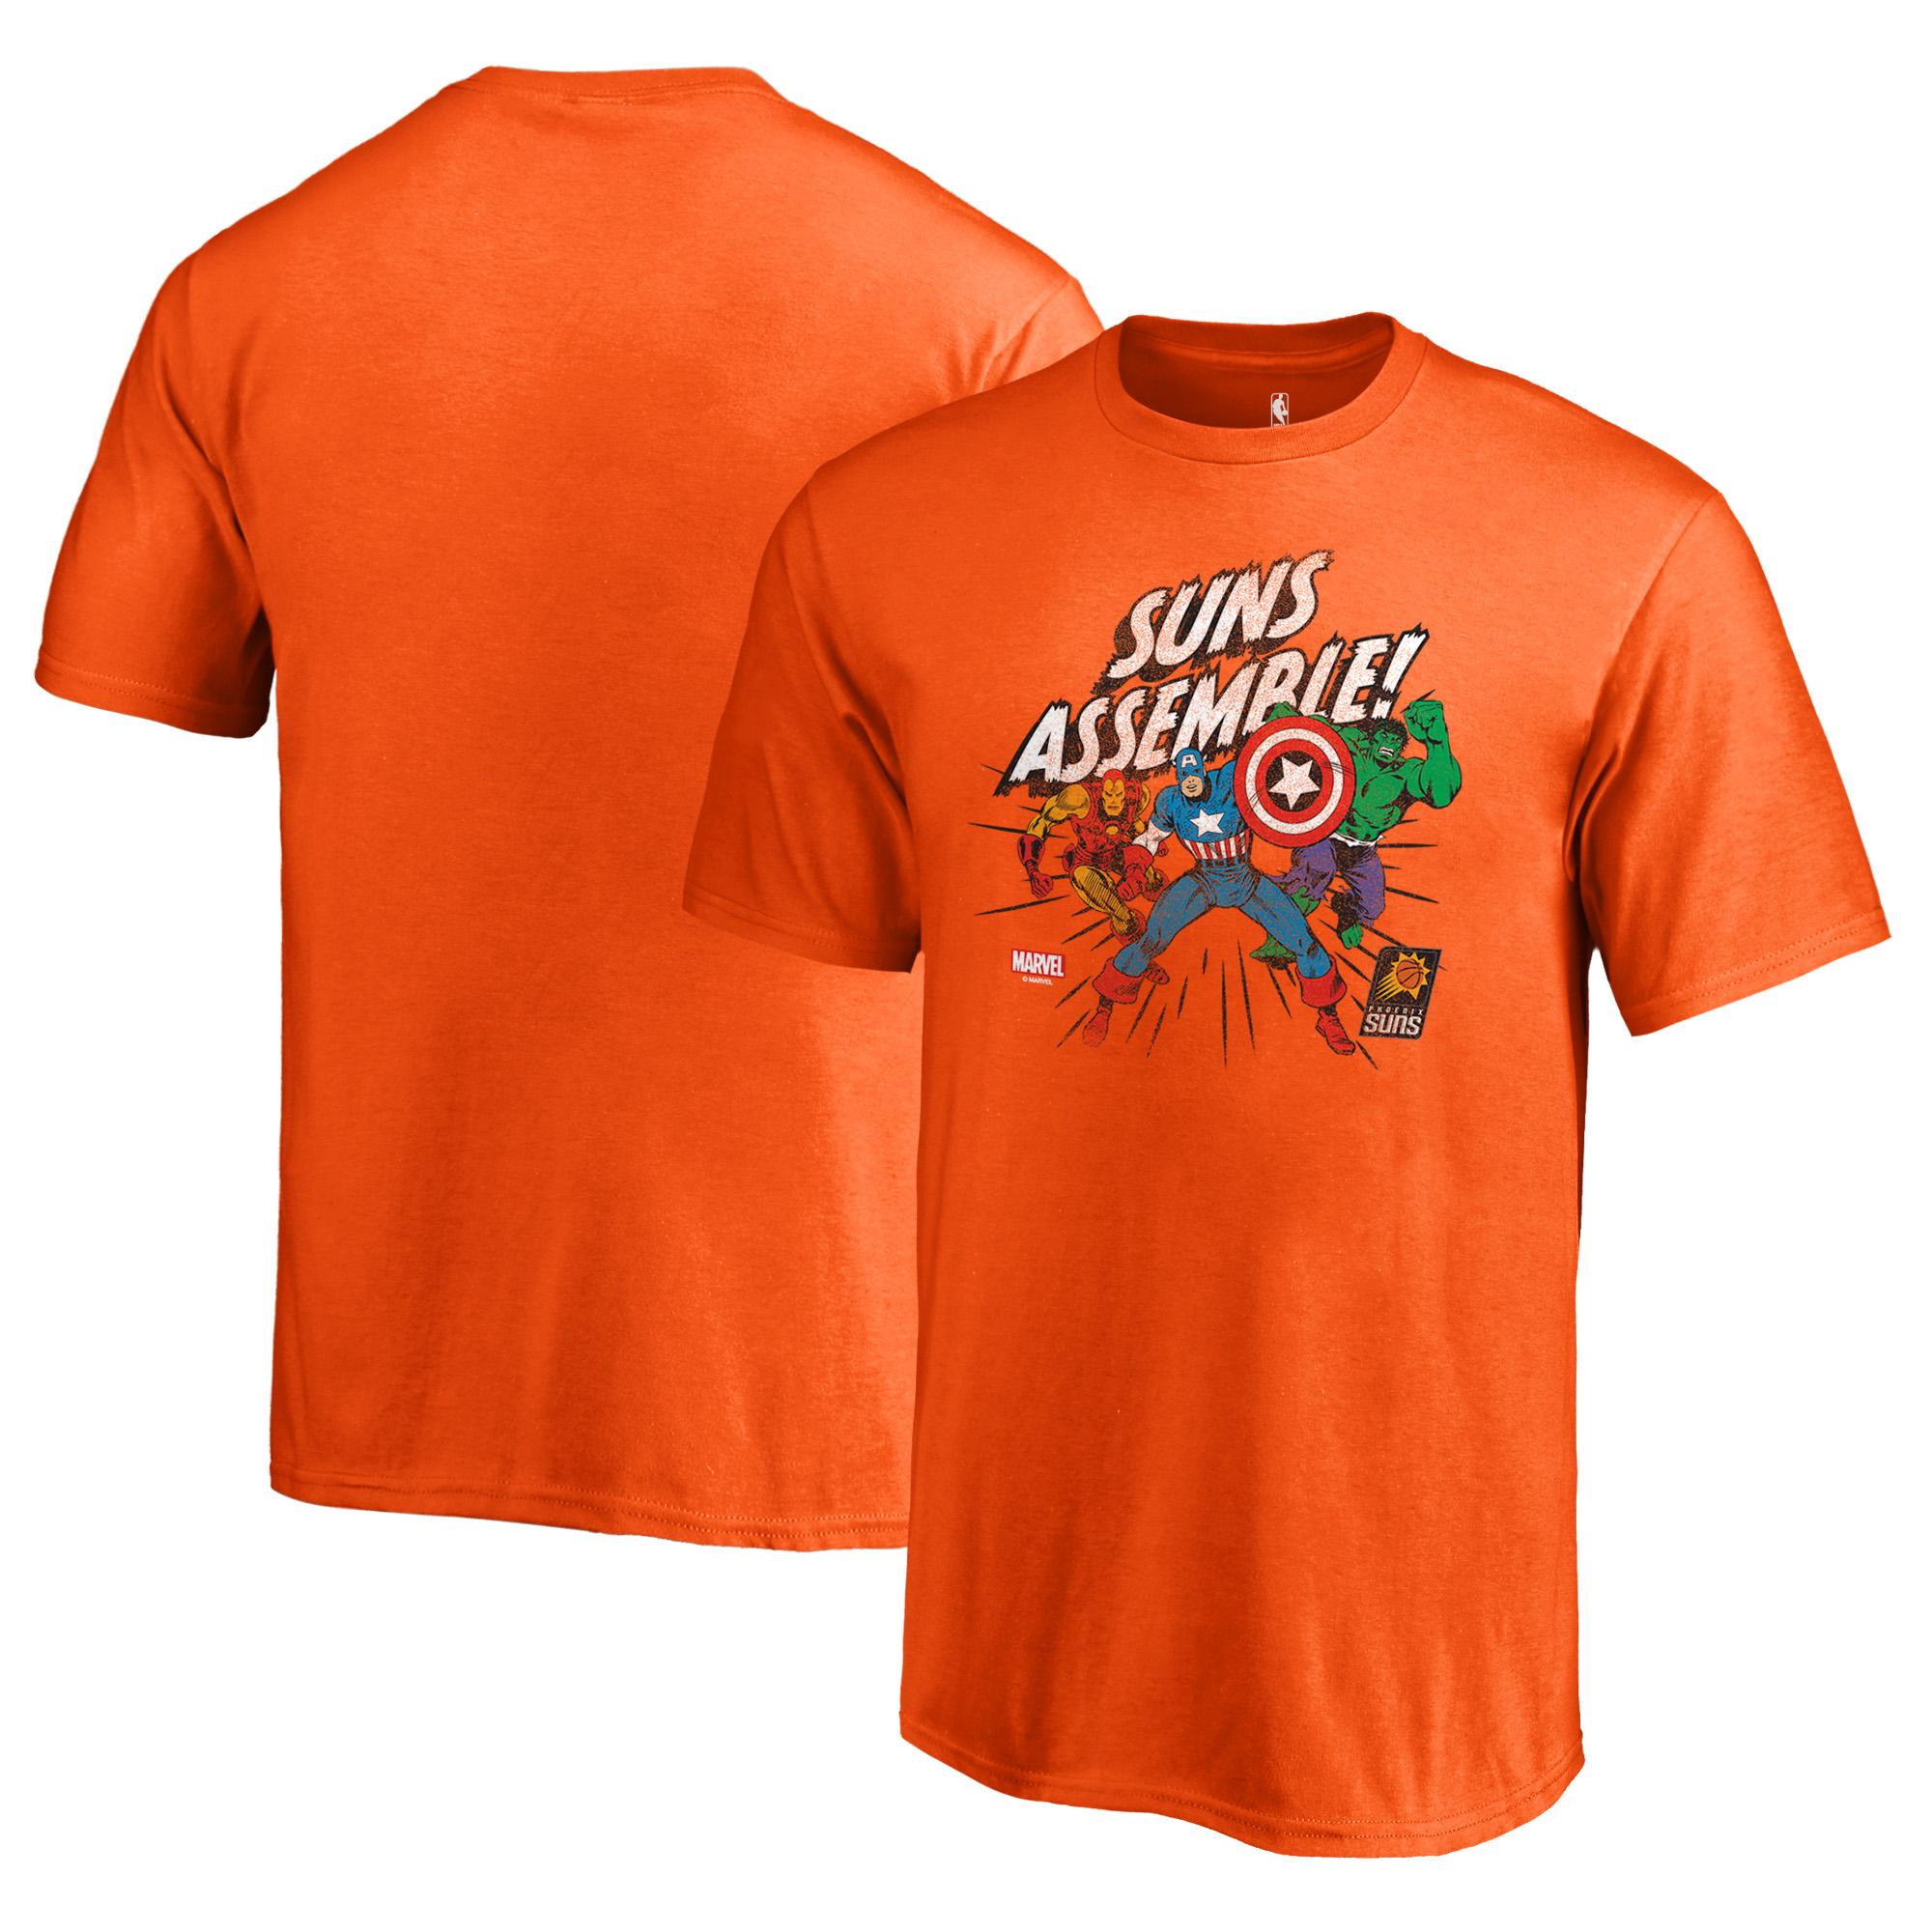 Phoenix Suns Fanatics Branded Youth Marvel Avengers Assemble T-Shirt - Orange